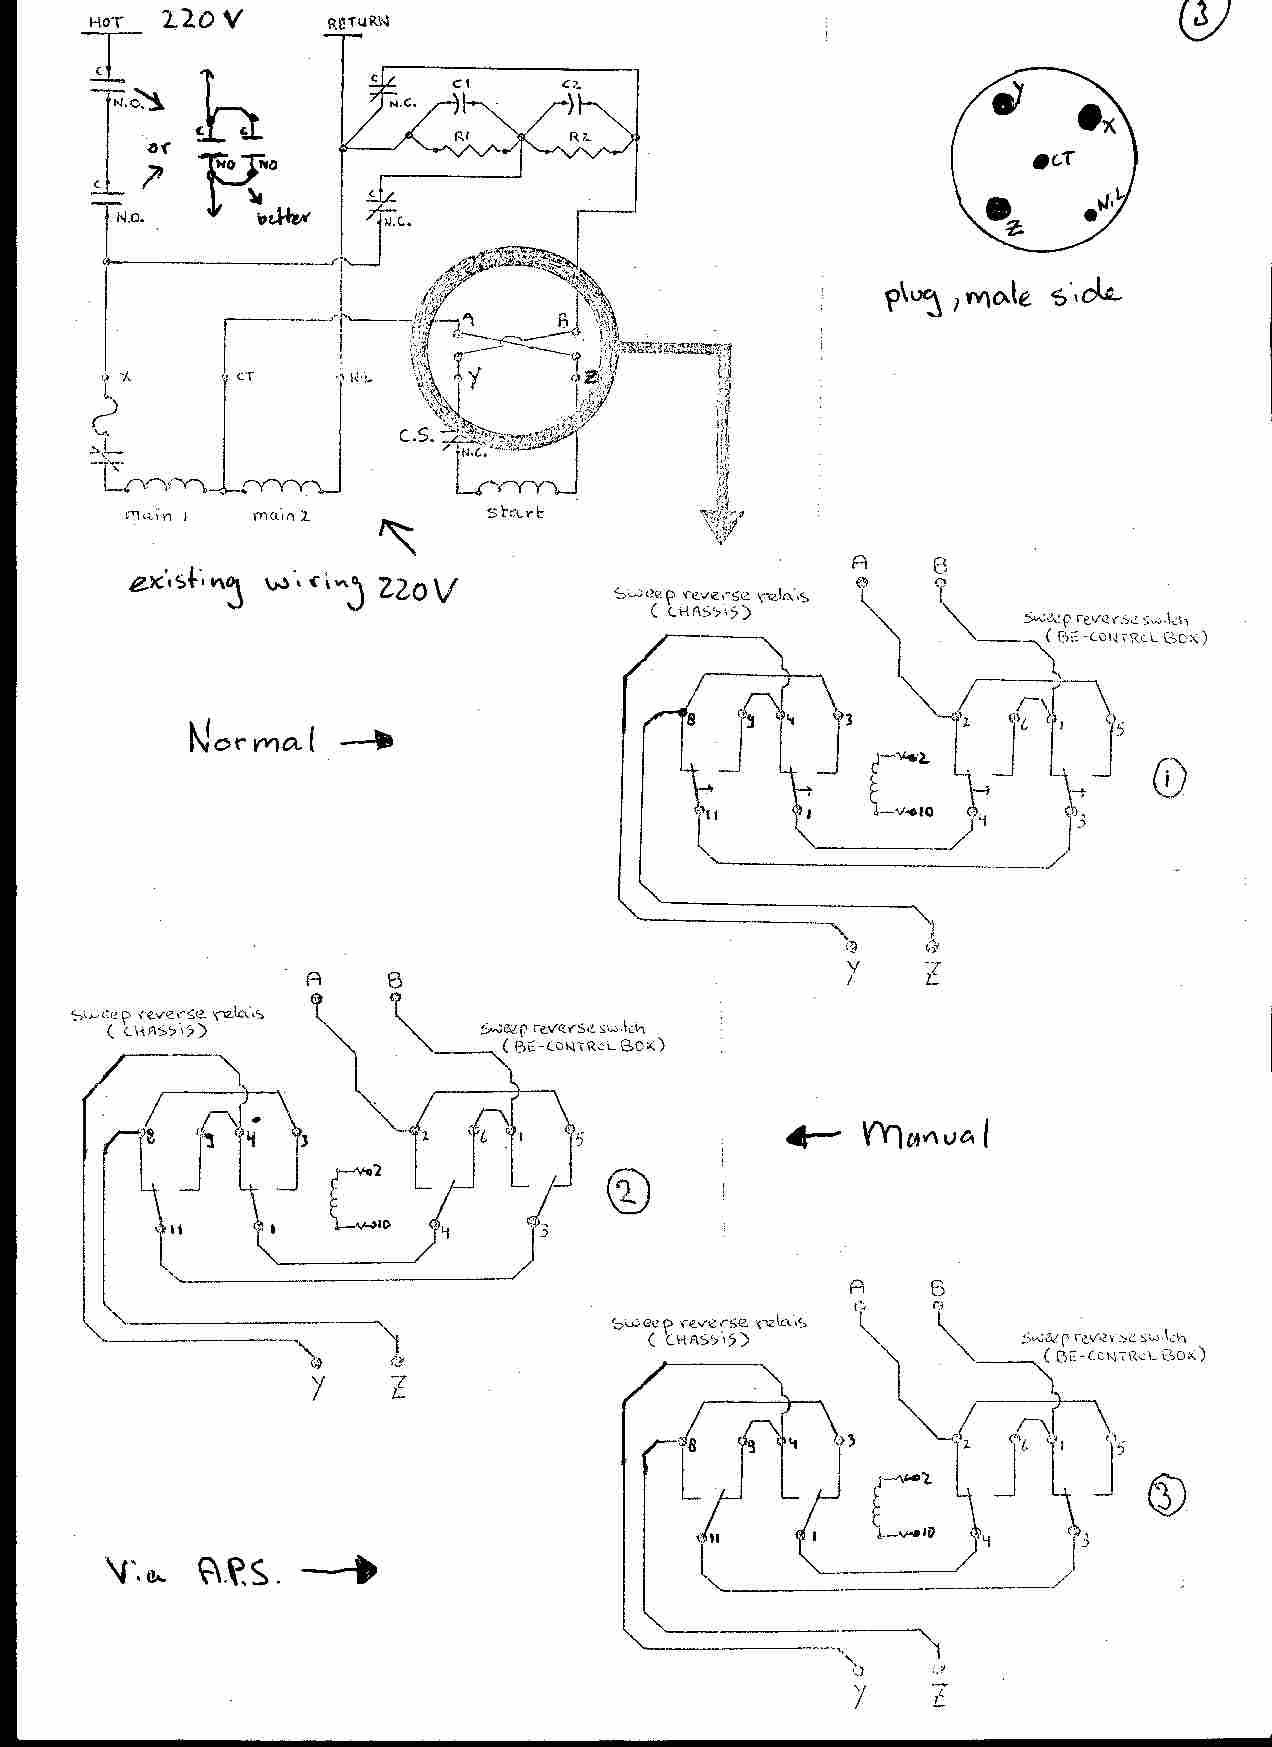 700r4 plug wiring diagram weg 3 phase motor manual lockup switch diagrams